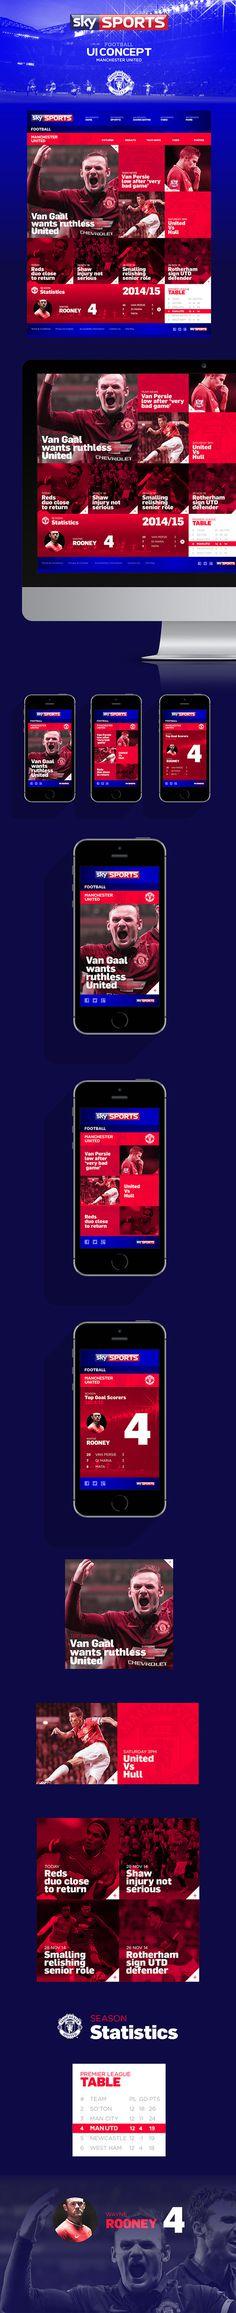 Sky Sports Football // UI Design Concept on Behance